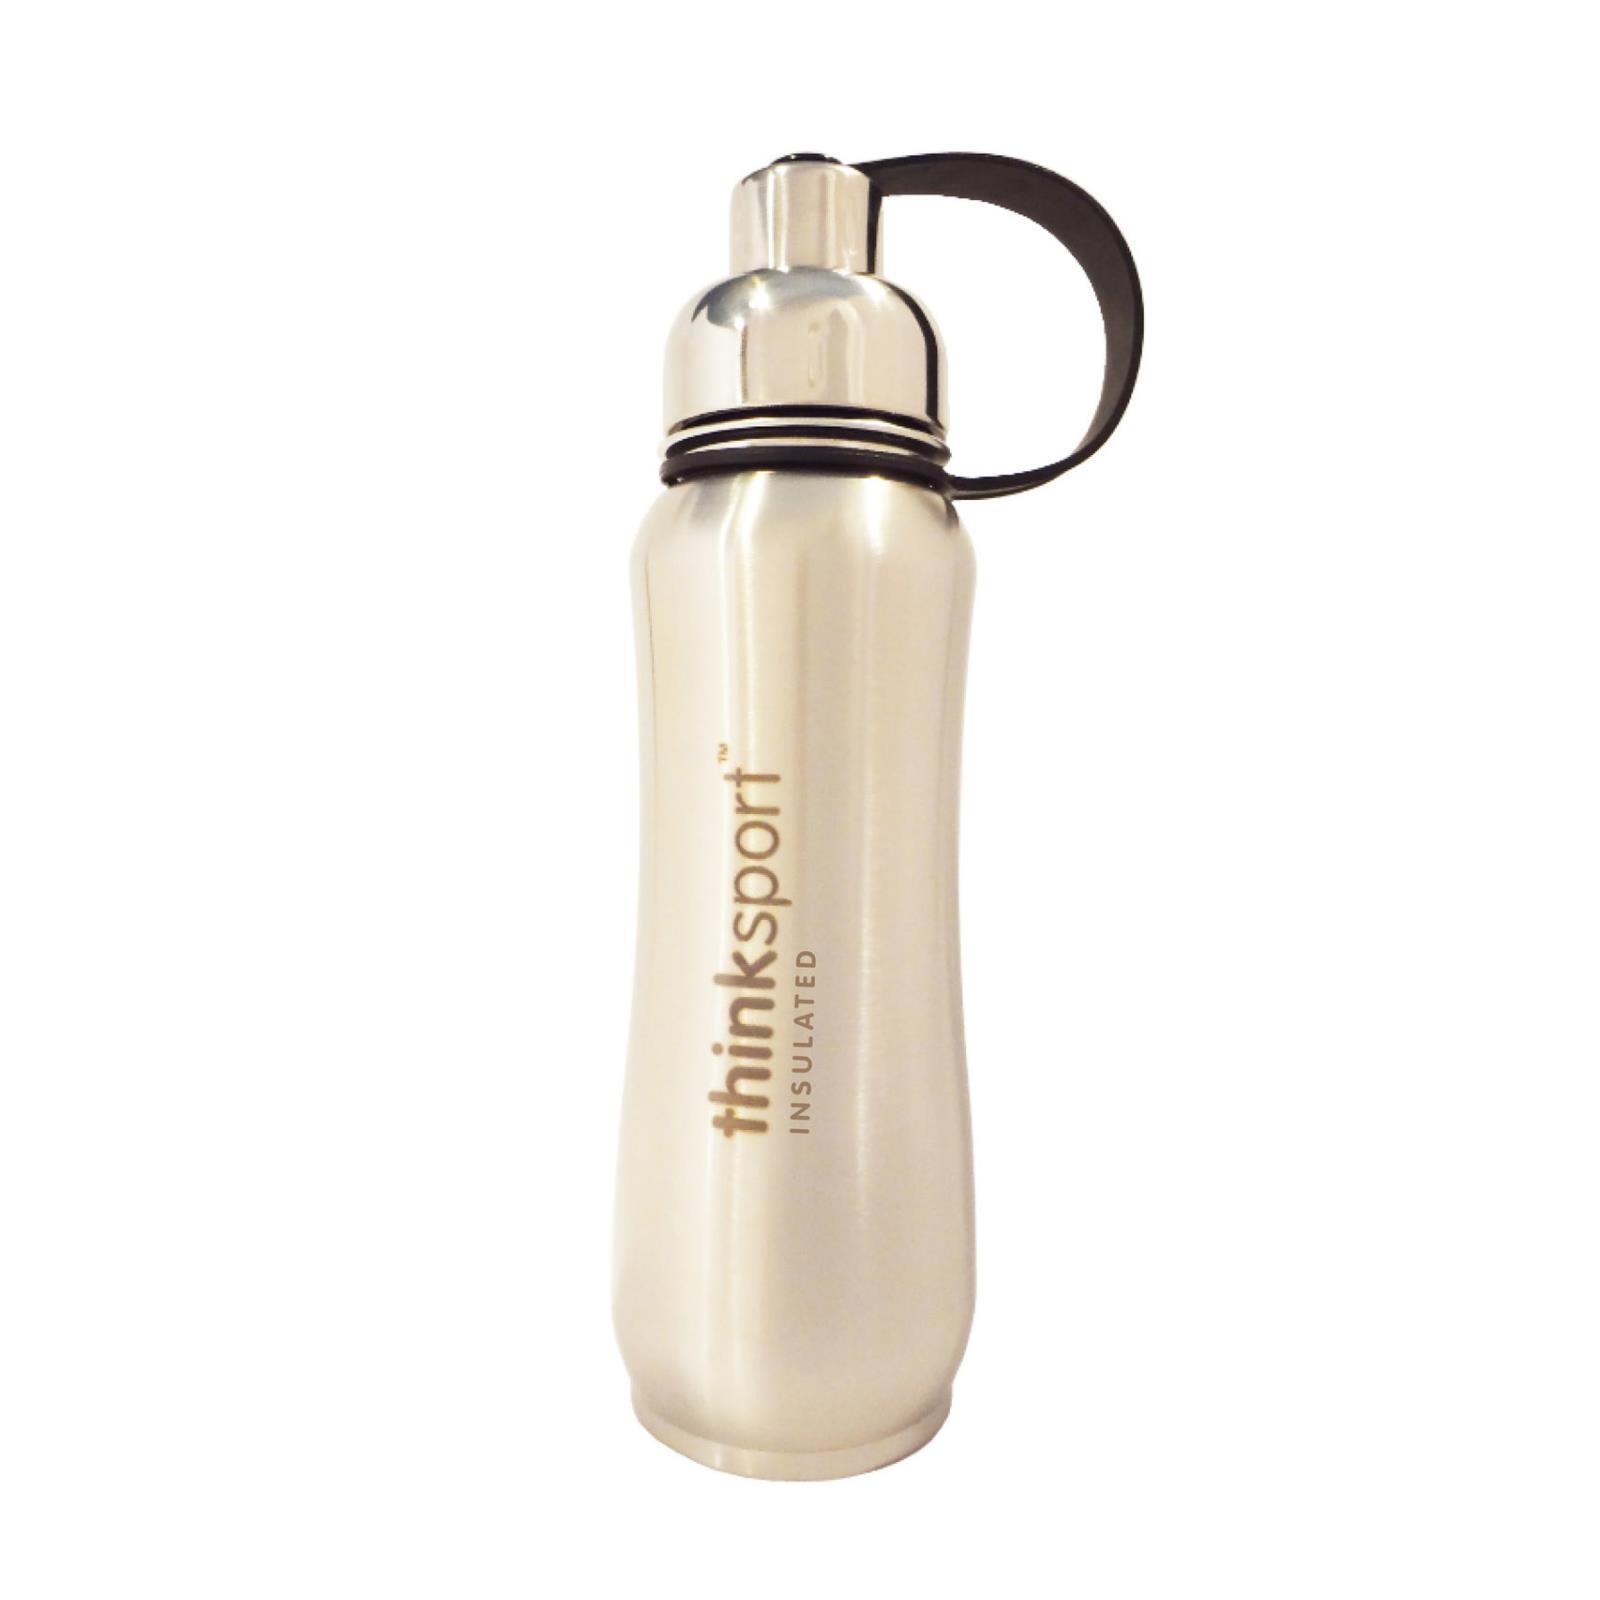 Thinksport Insulated Sports Bottle - Silver - 17 fl oz